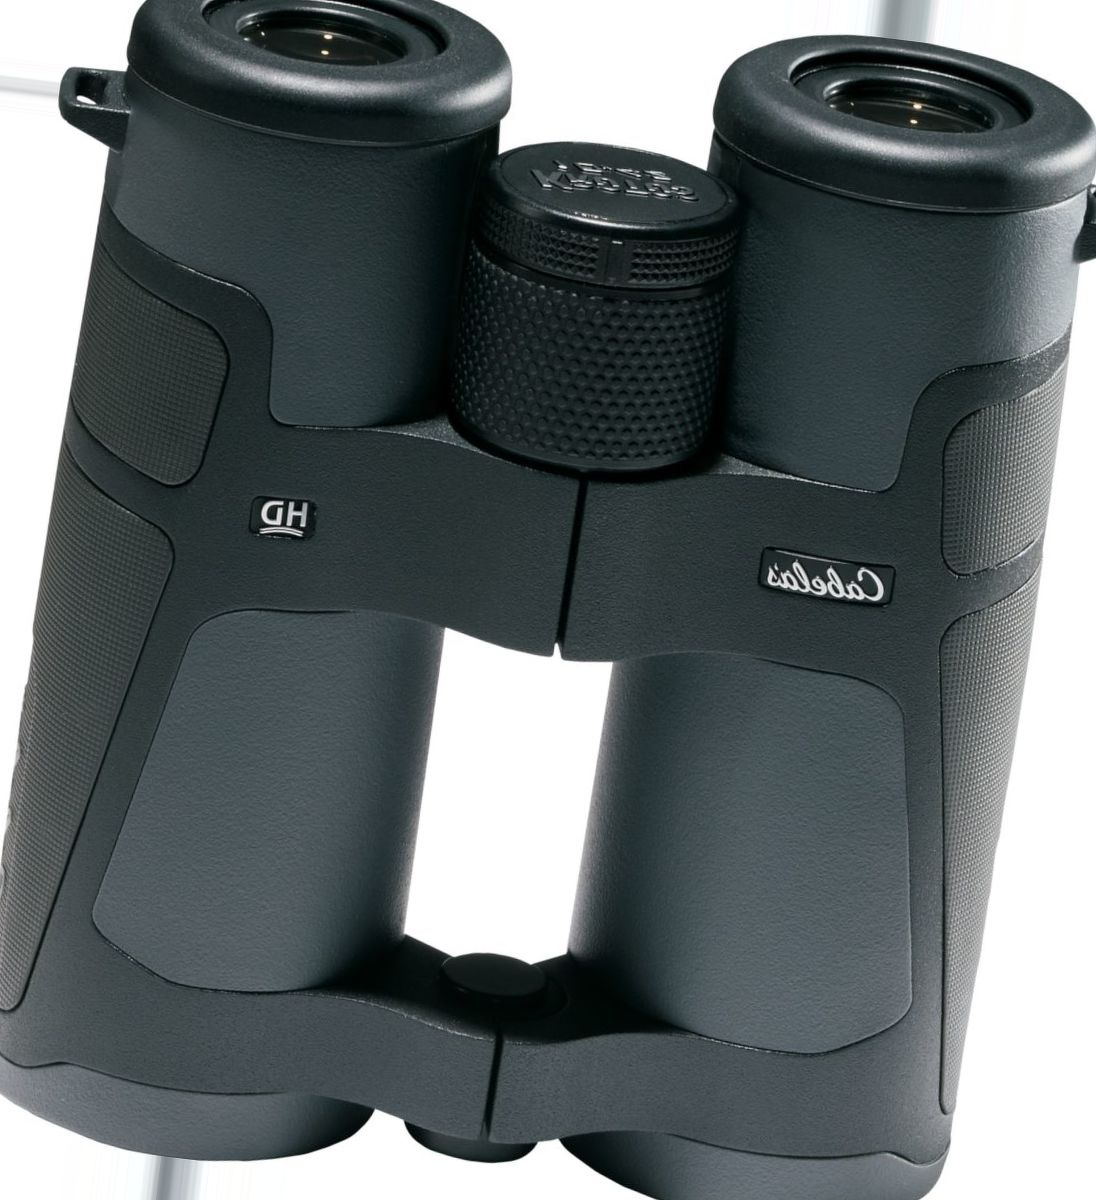 Cabela's Krotos HD Binoculars